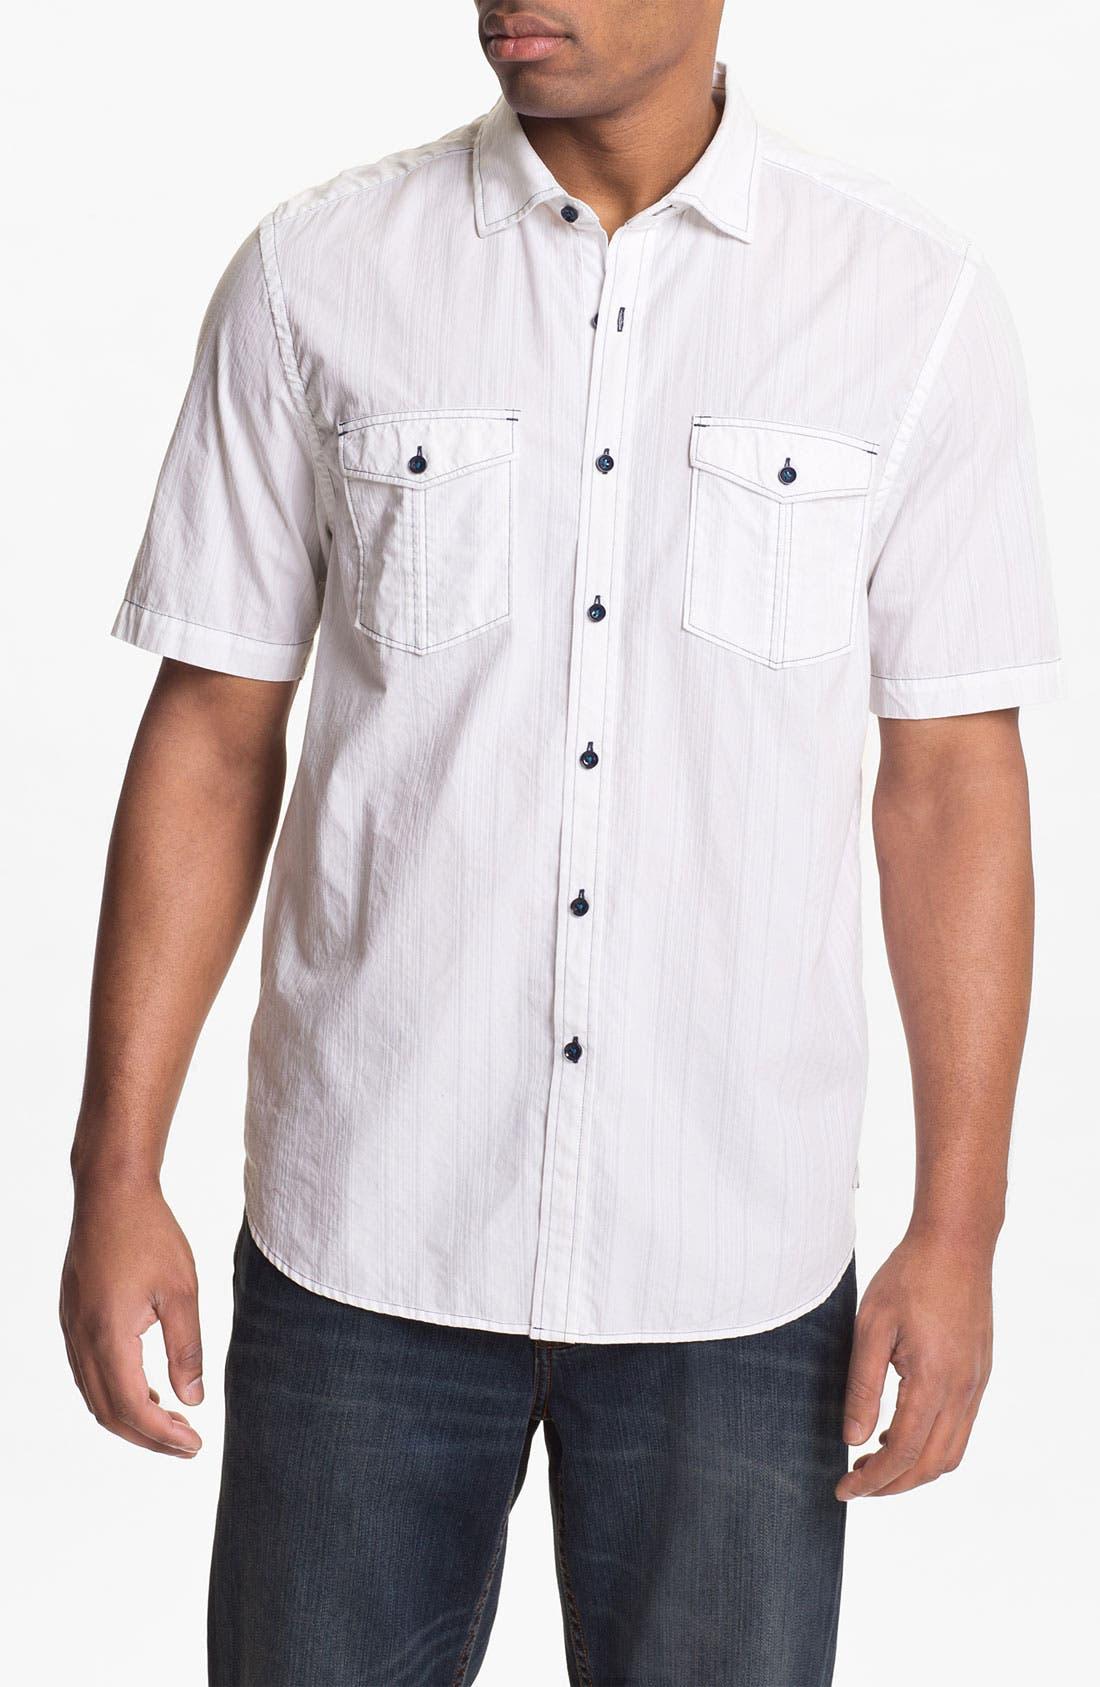 Alternate Image 1 Selected - Tommy Bahama Denim 'Dobby Blanco' Sport Shirt